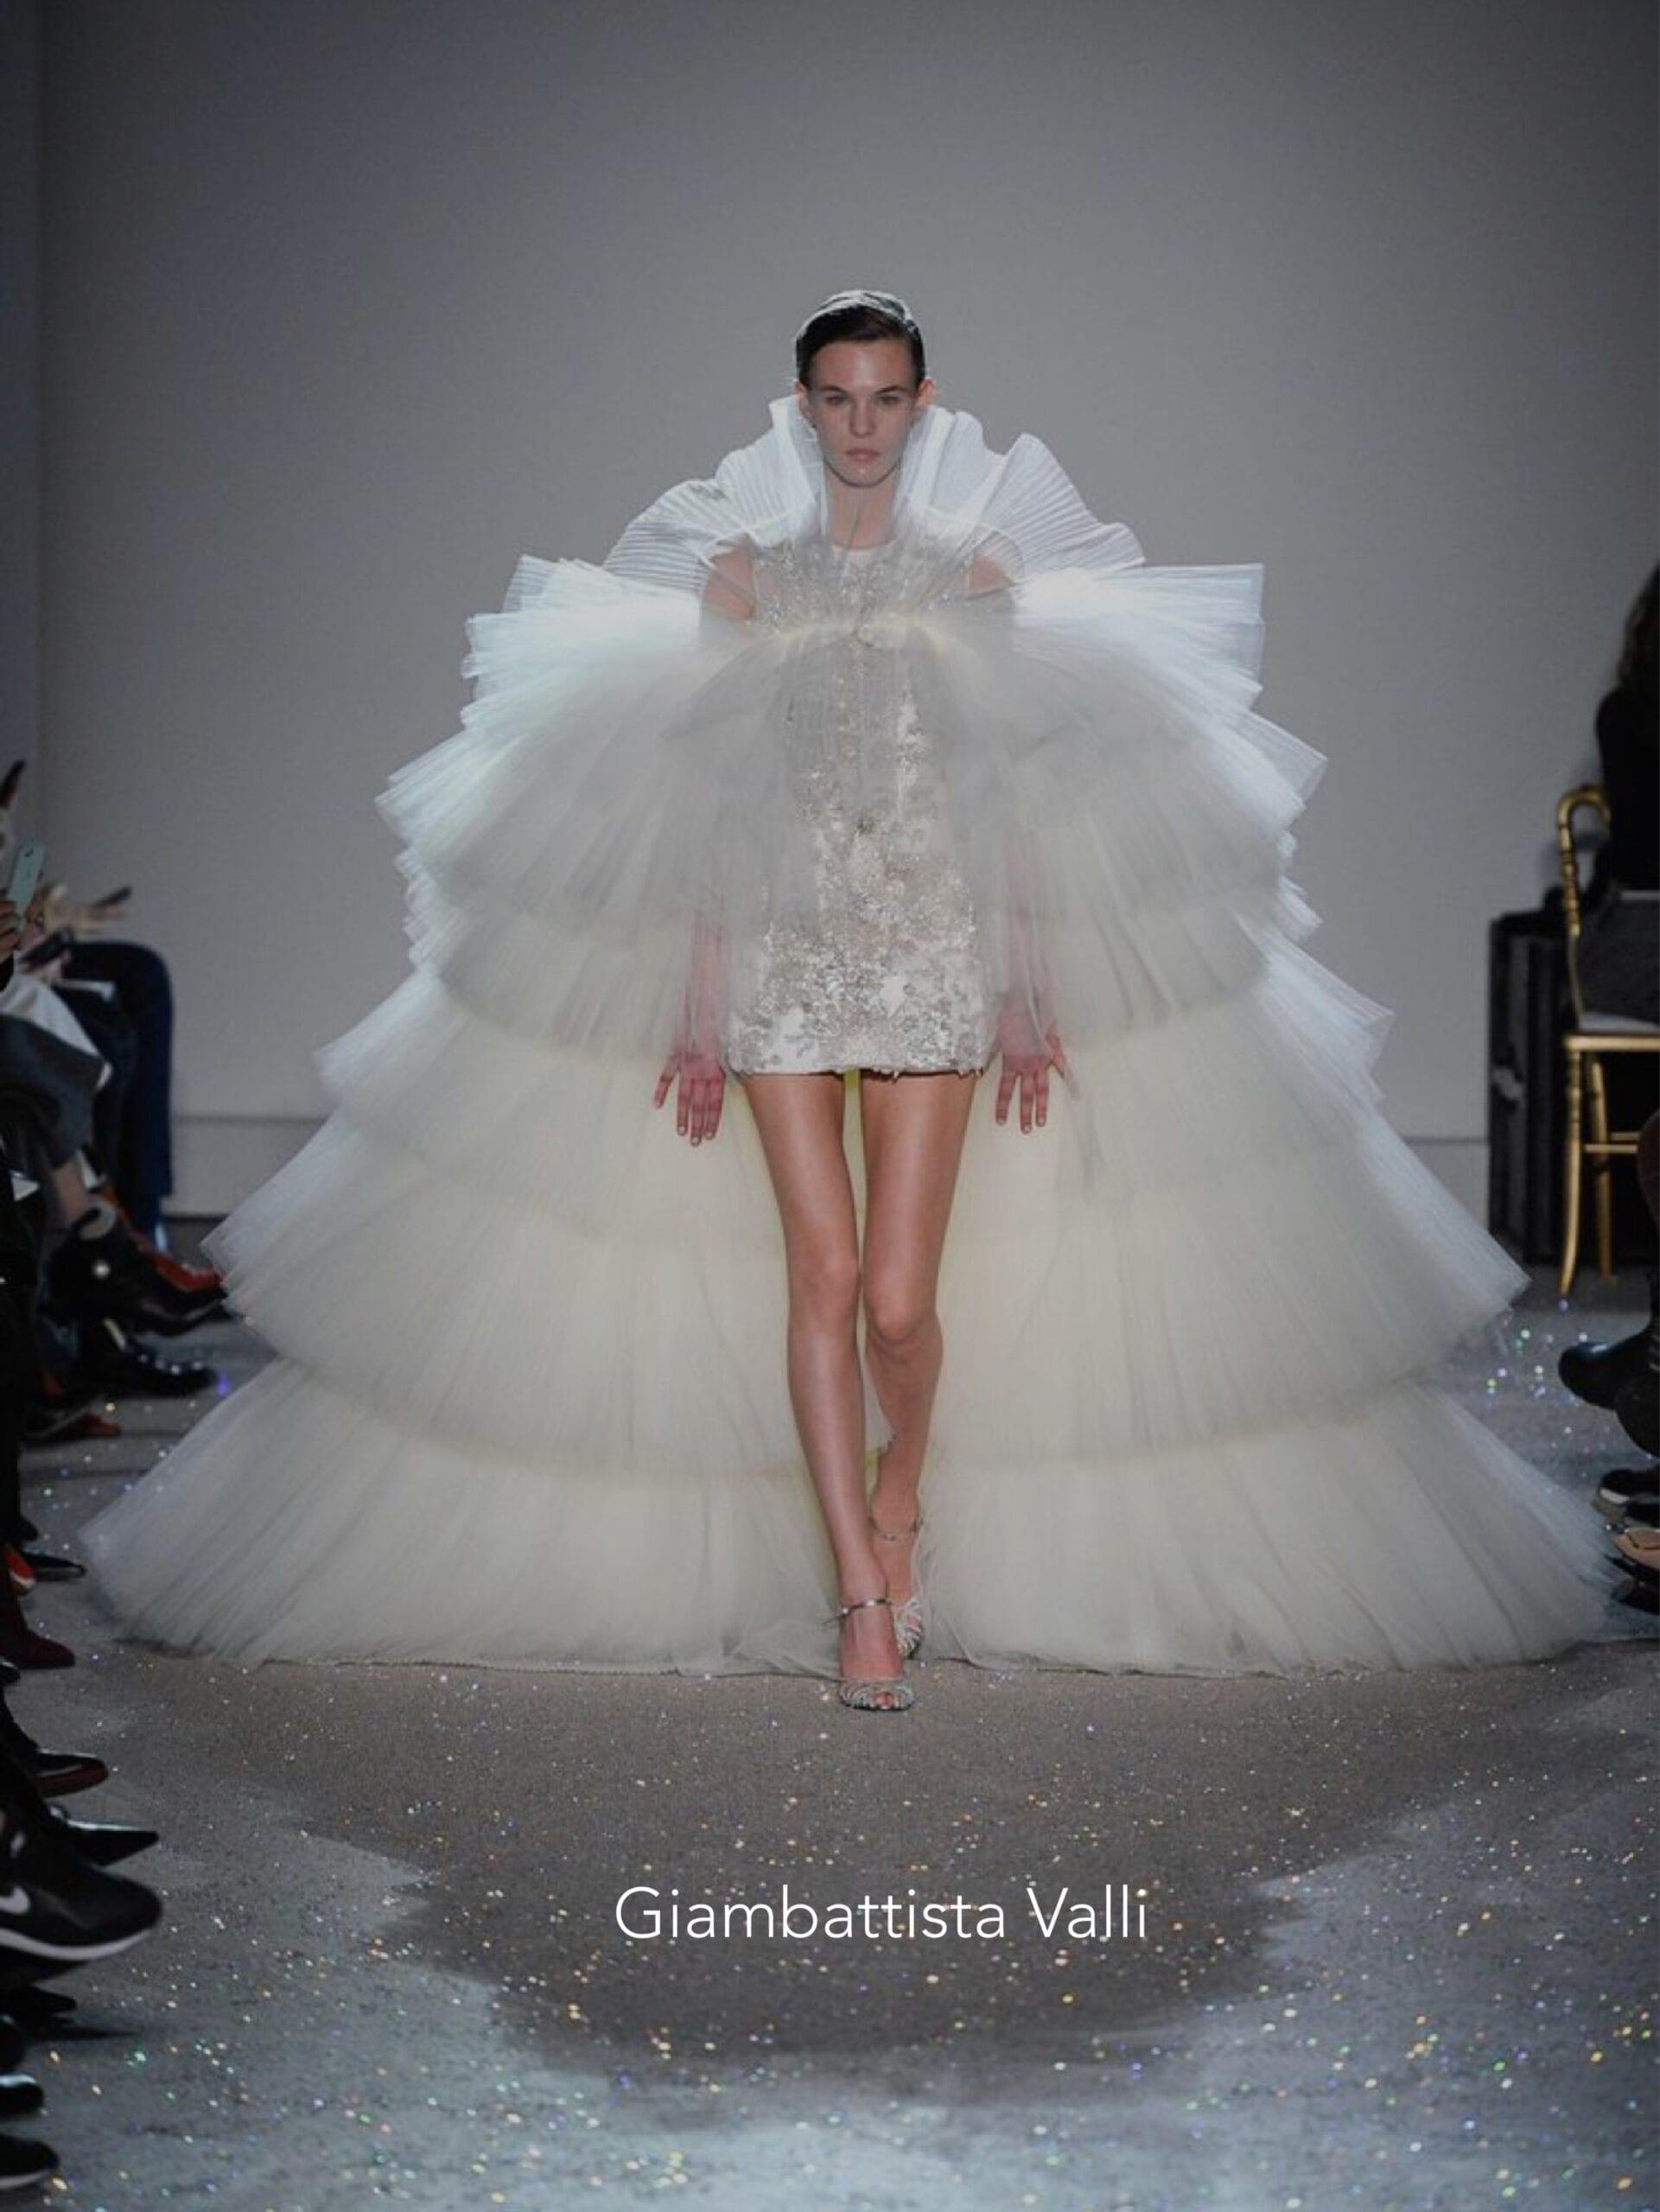 Giambattista valli spring 2019, haute couture spring 2019, haute couture paris 2019, blogger moda italia famose 2019